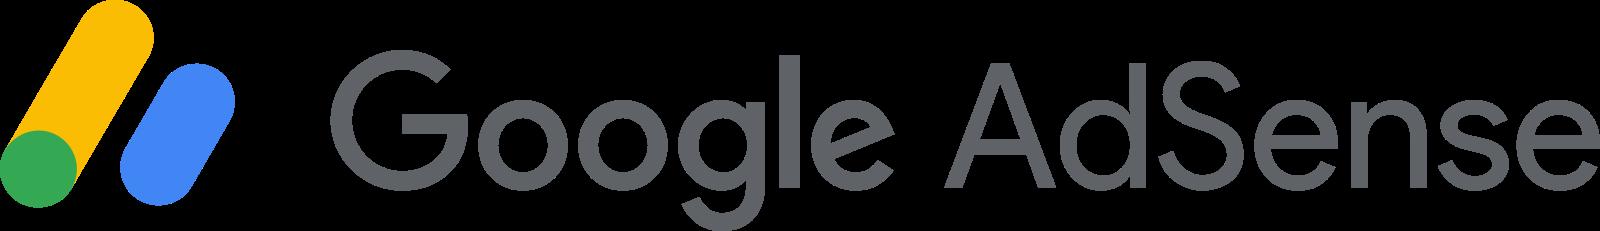 google adsense logo 2 1 - Google Adsense Logo